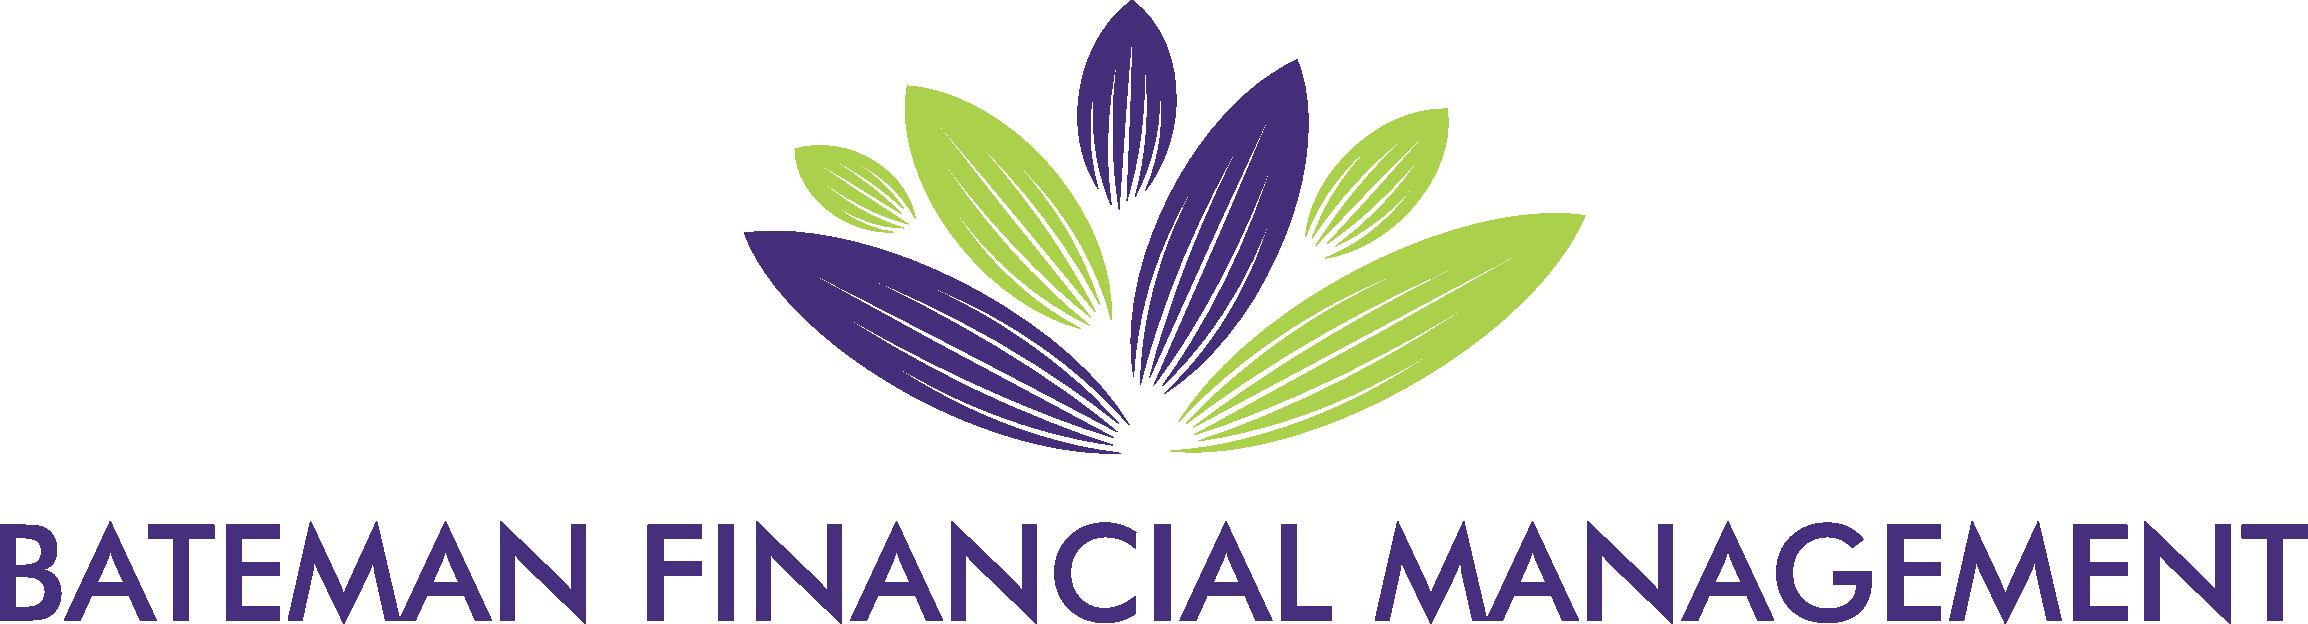 Bateman Financial Management Ltd logo